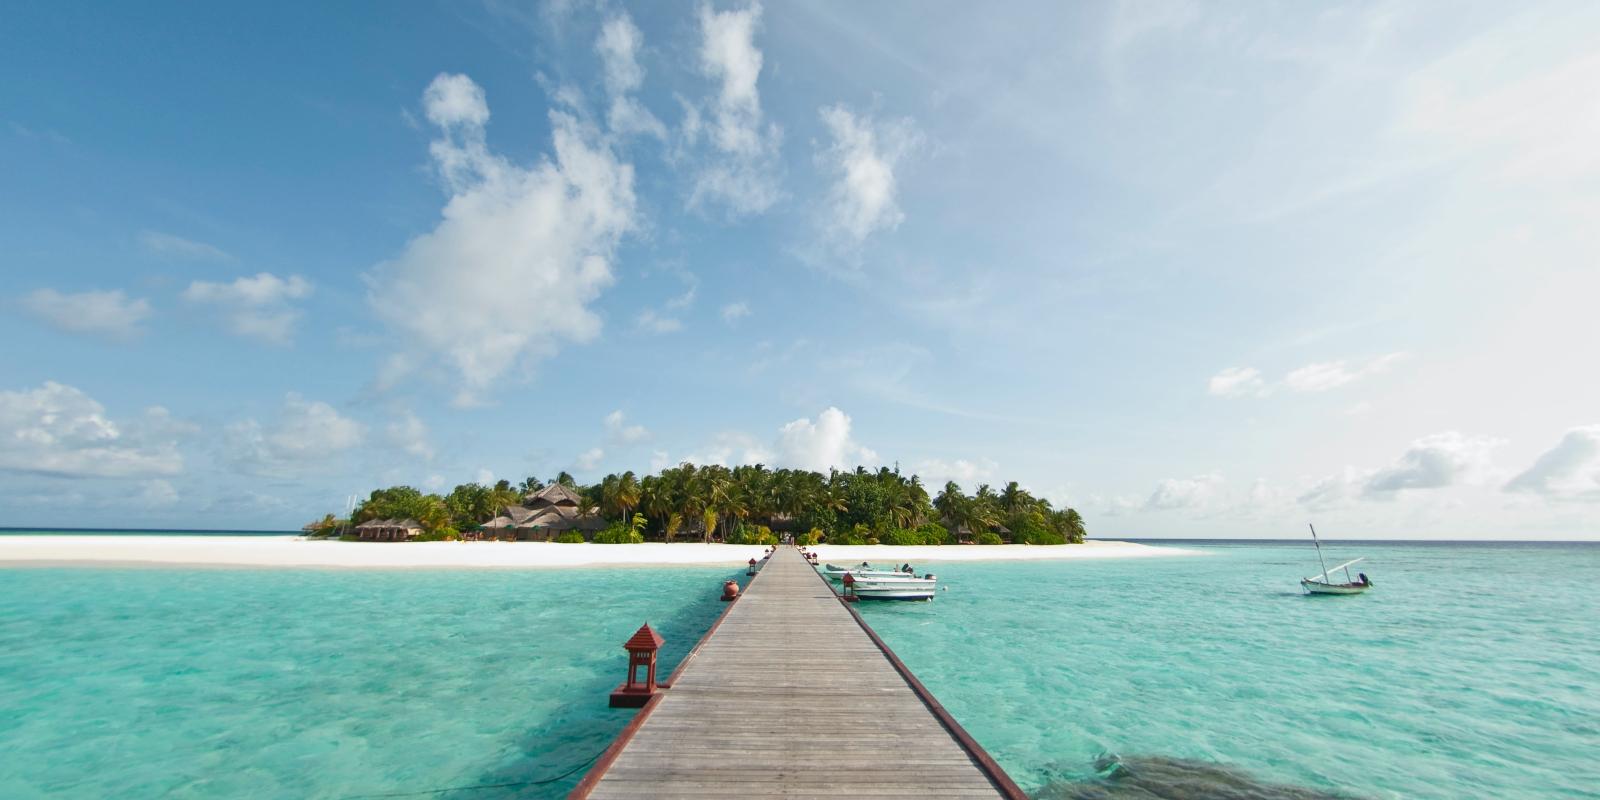 Travel blog: The Maldives on a Budget: 5 Tips & Tricks